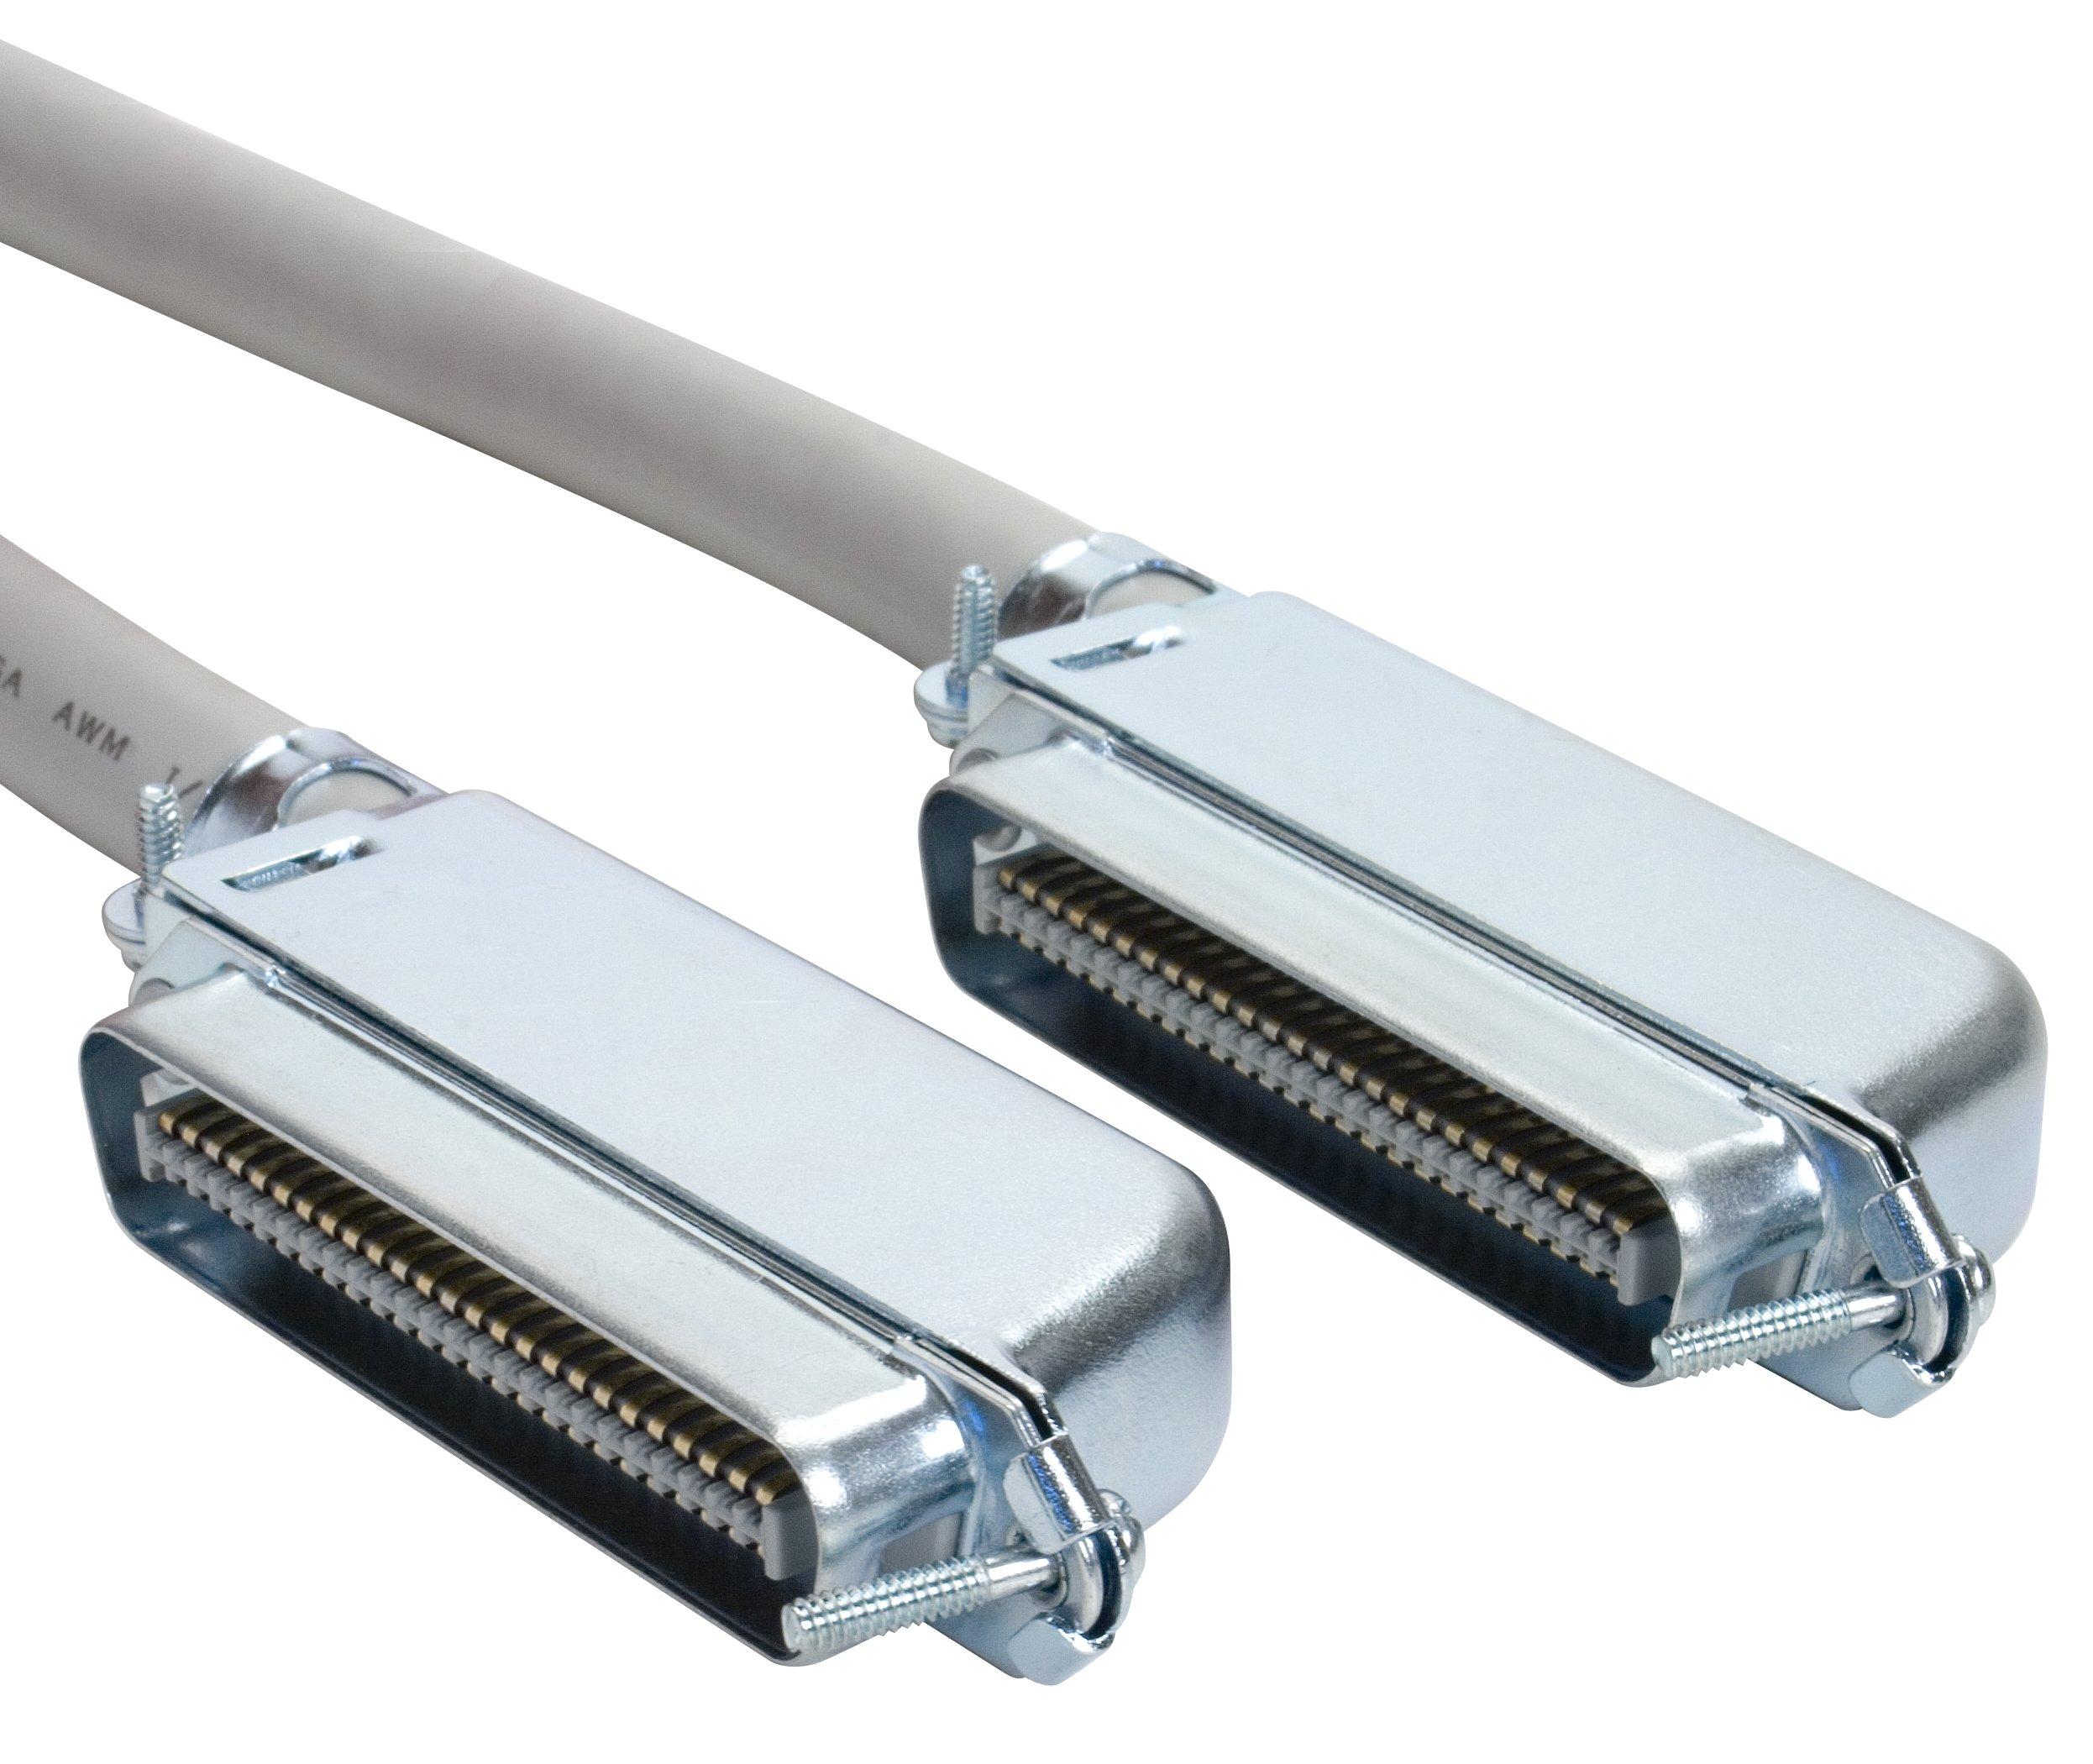 Amphenol MP-5T90MMUNNA-005 Cat3 25-Pair Telco Cable, 90 degree, 50-Pin RJ21, Male, 5', Gray